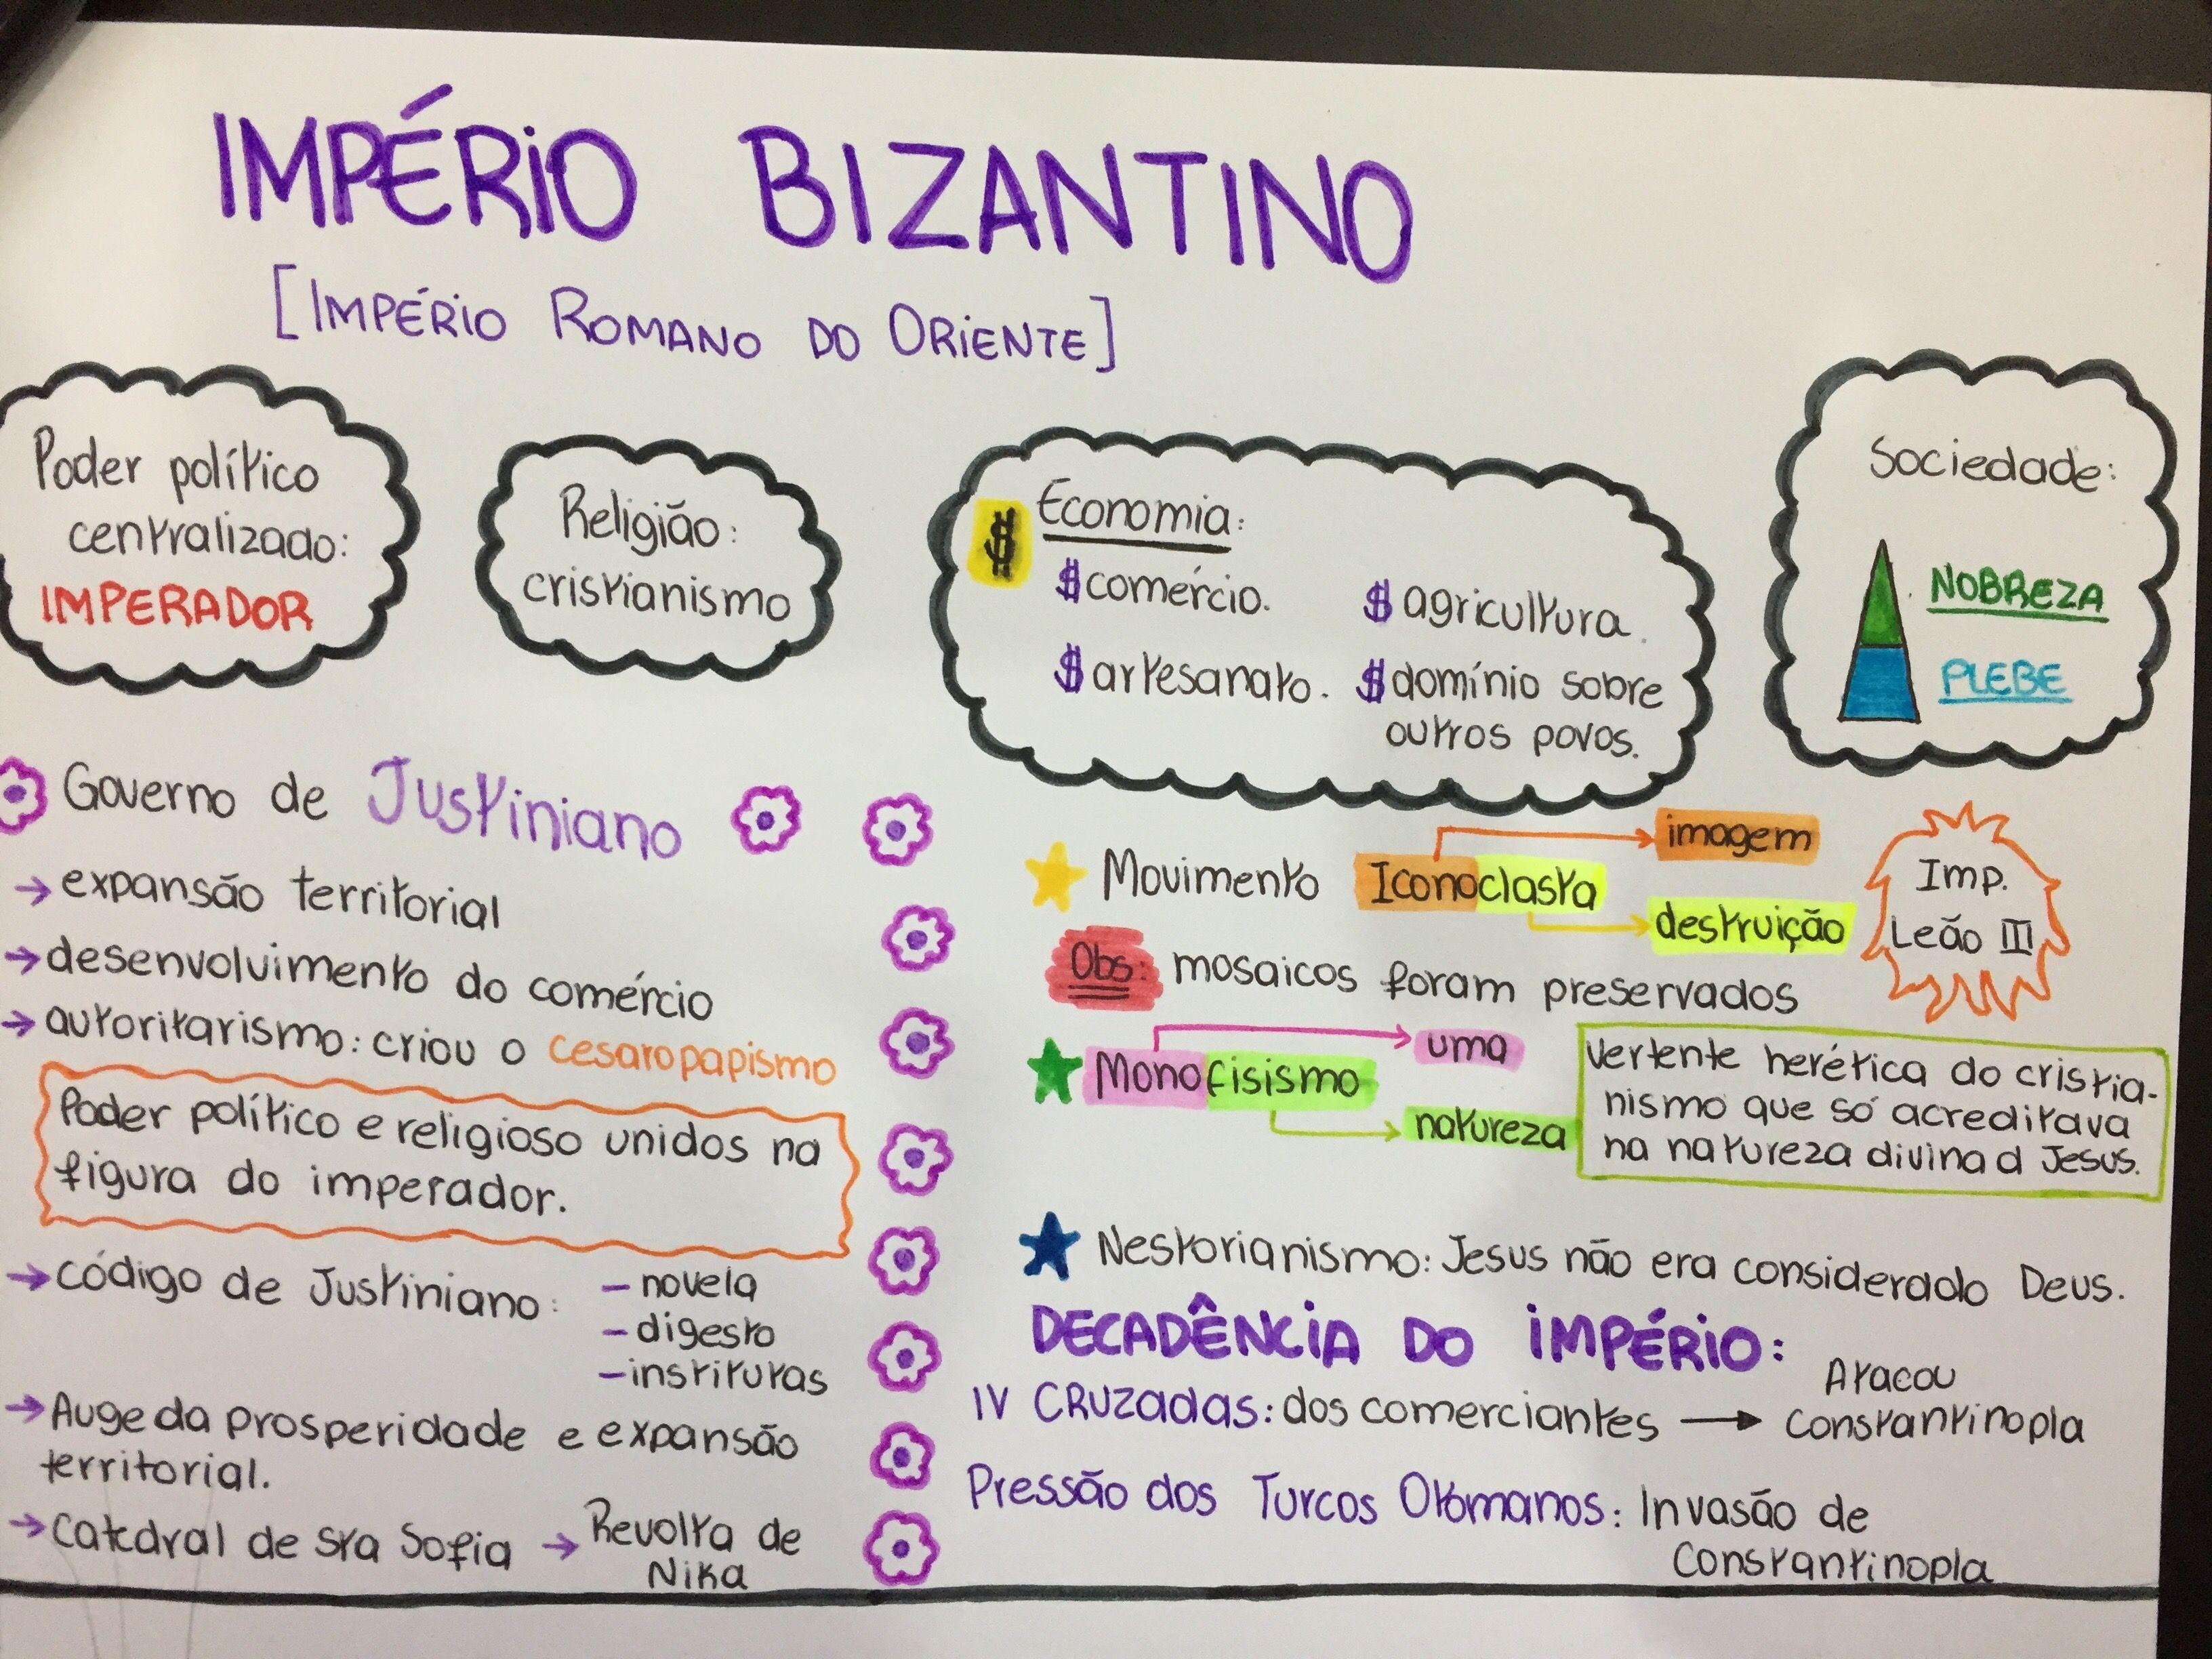 imprio bizantino medieval study notes study organization student life mind maps